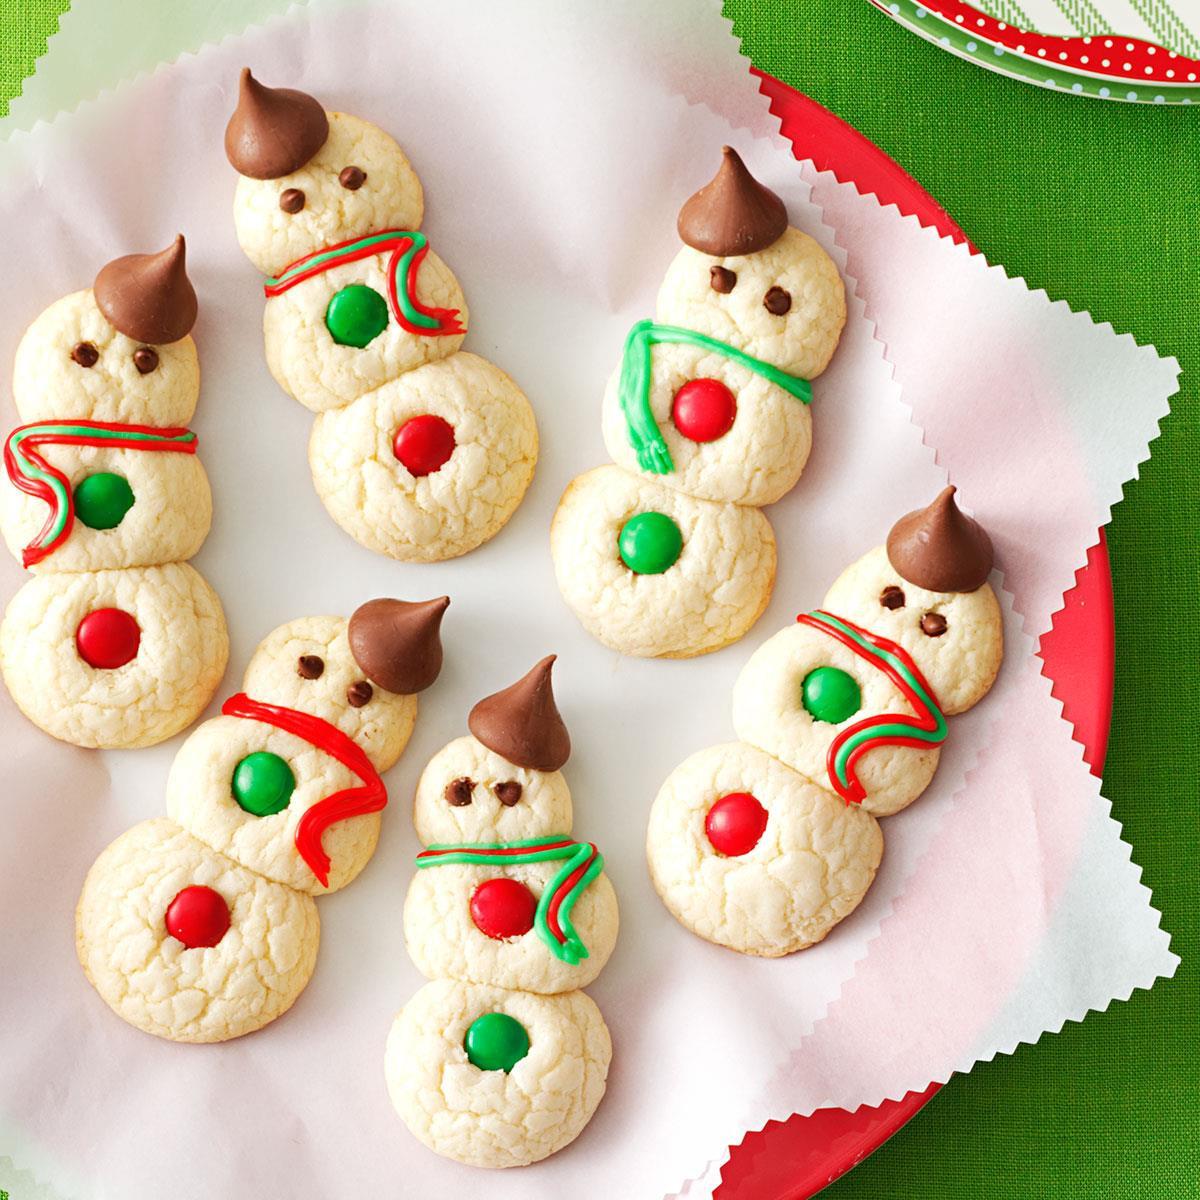 Best Christmas Cookies To Make  Snowman Cookies Recipe